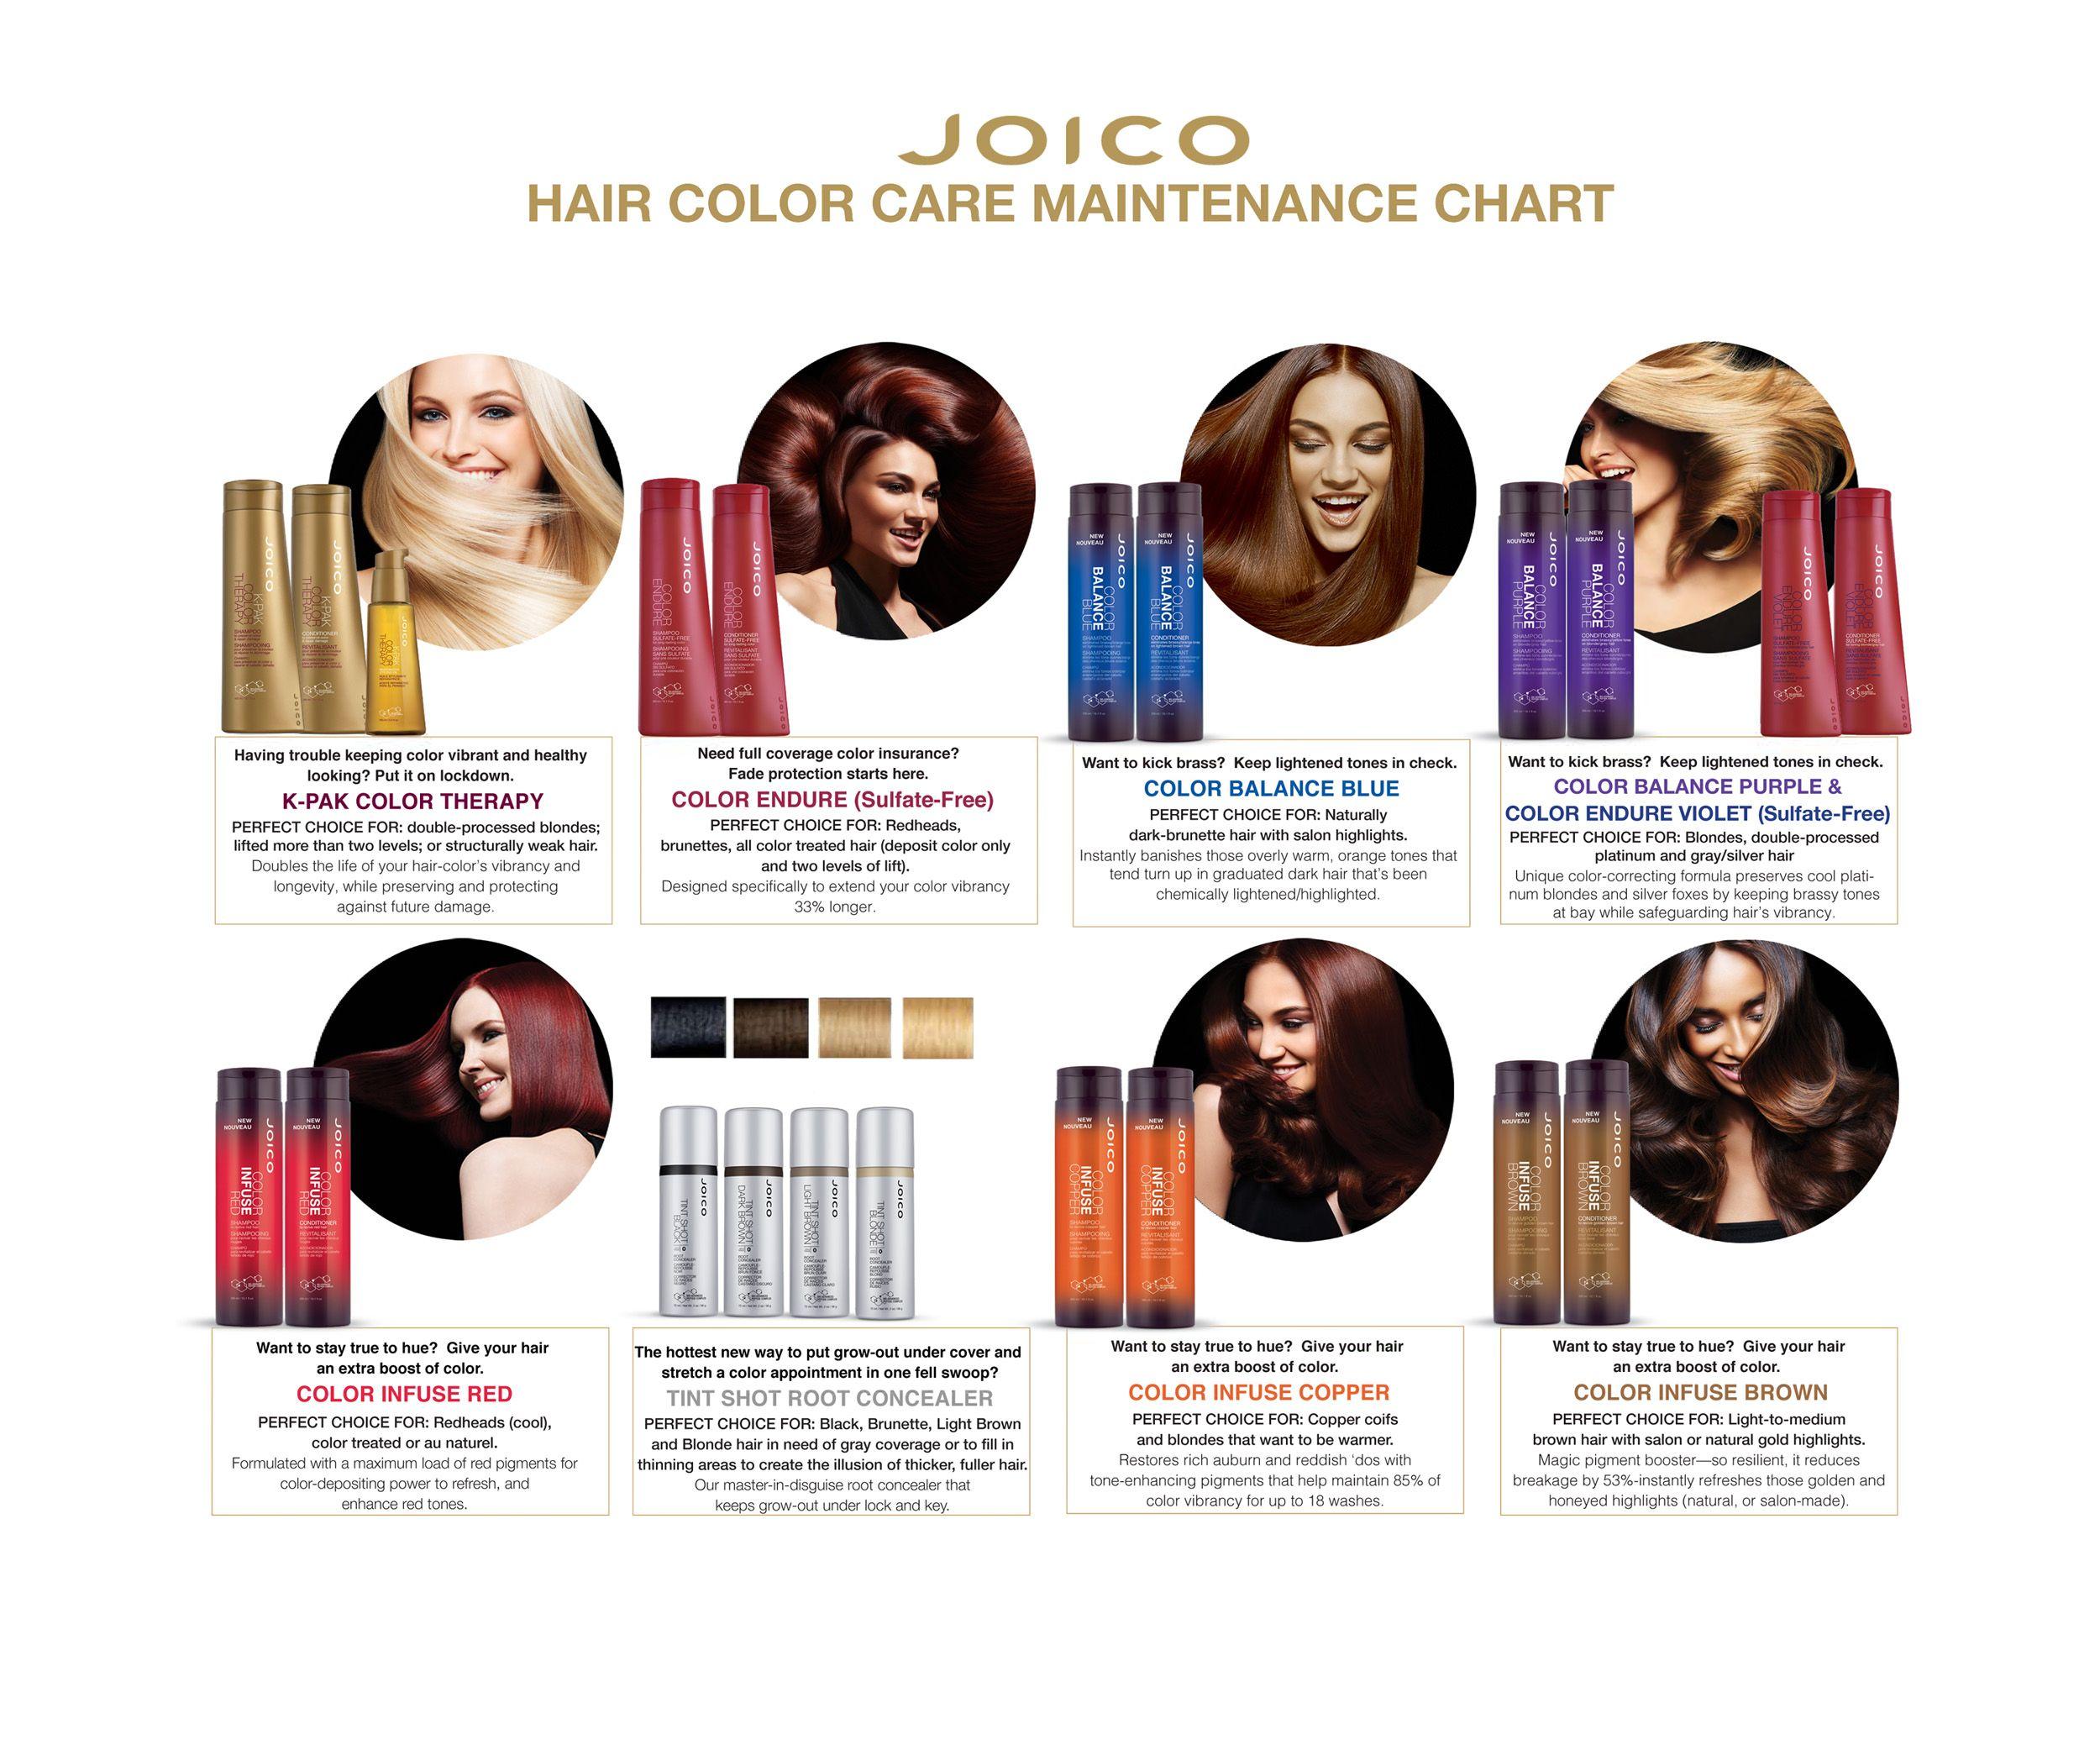 Joico Hair Color Care Maintenance Chart